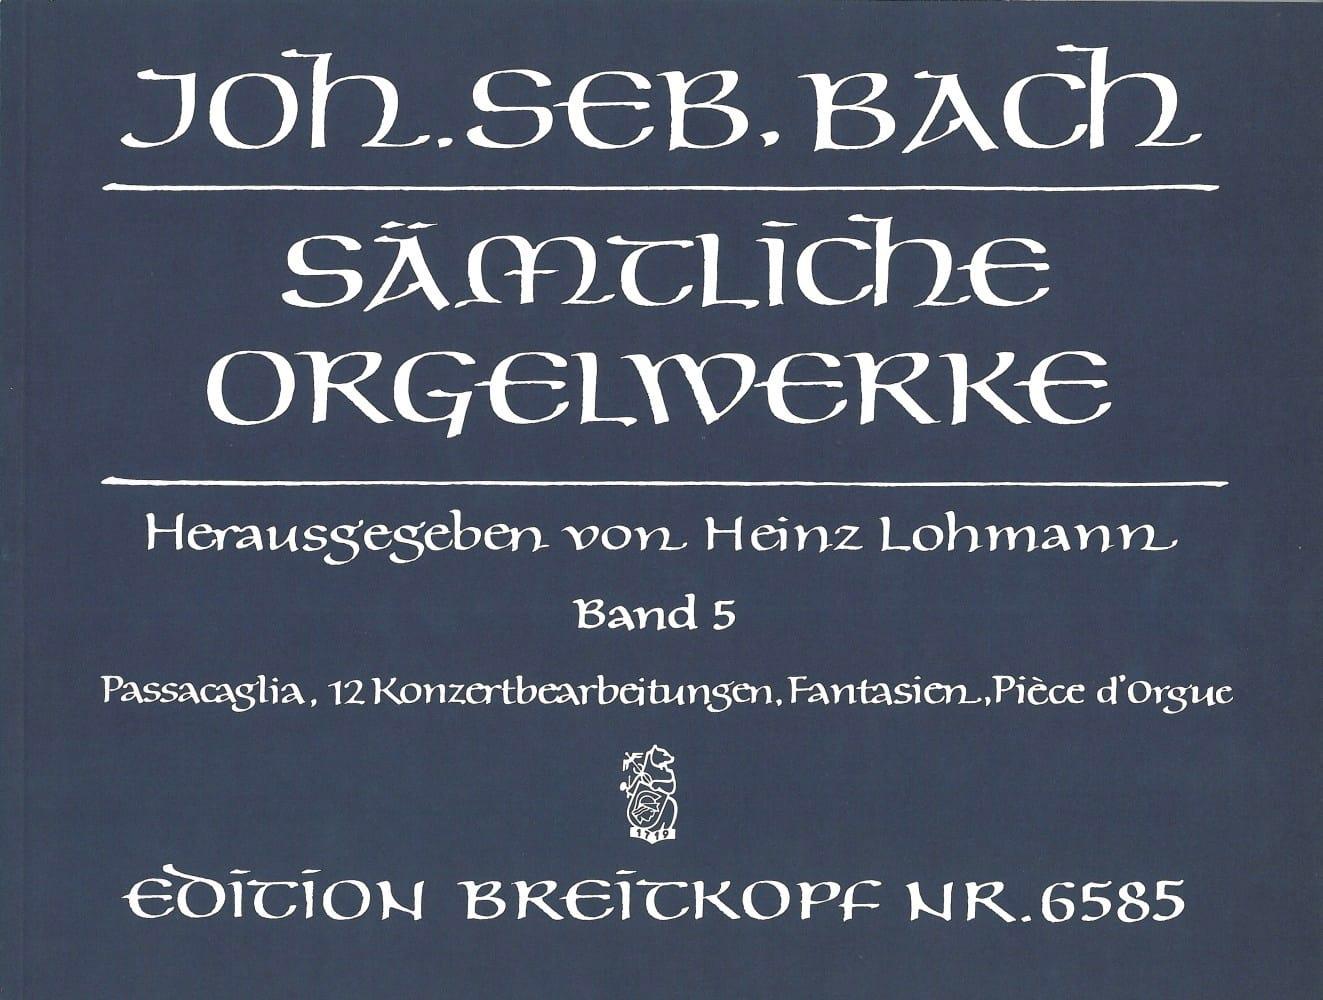 Sämtliche Orgelwerke Volume 5 - BACH - Partition - laflutedepan.com